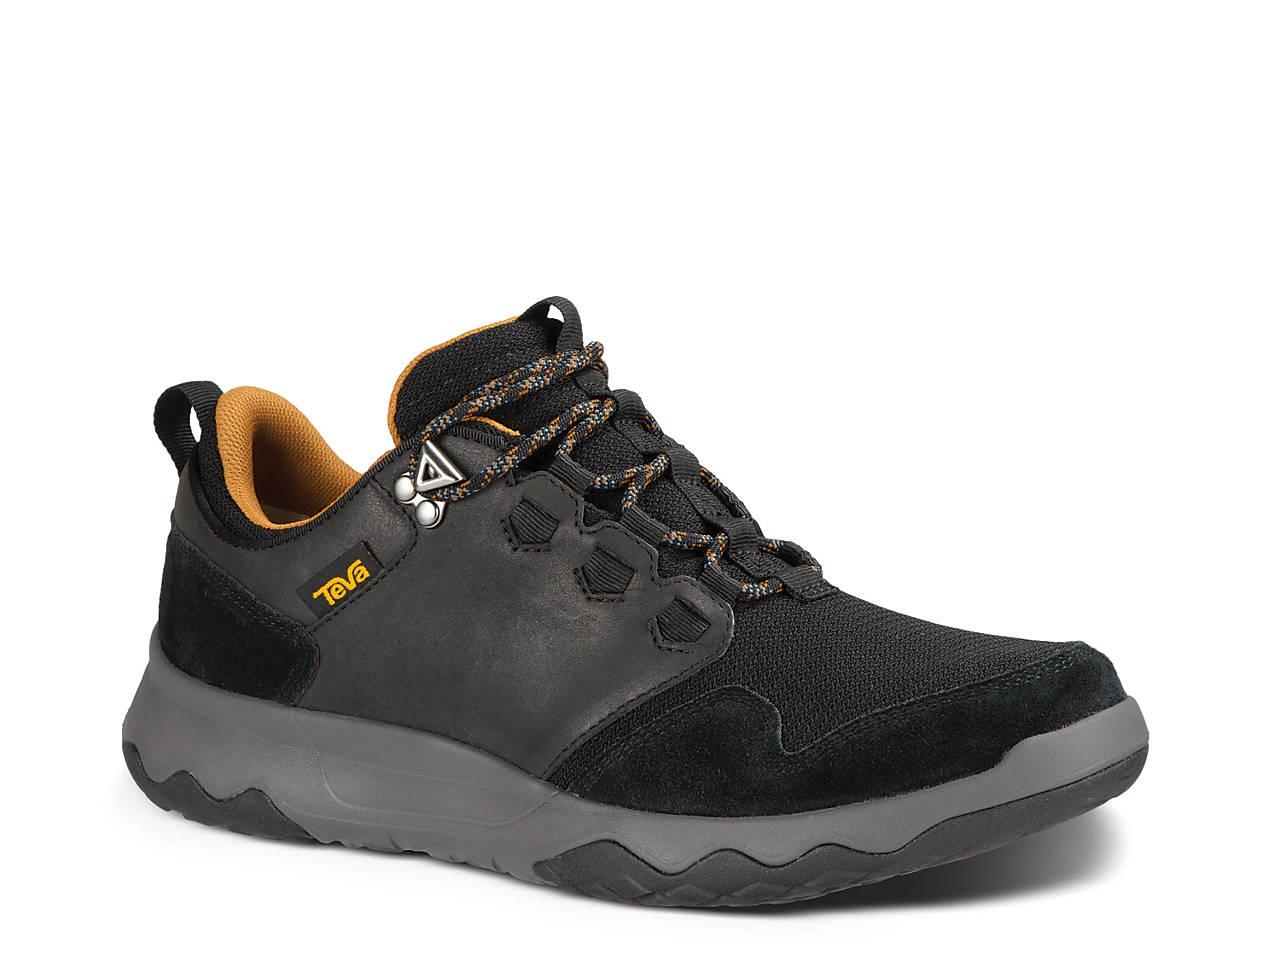 32b3b3e606ec7 Teva Arrowood Trail Shoe Men s Shoes